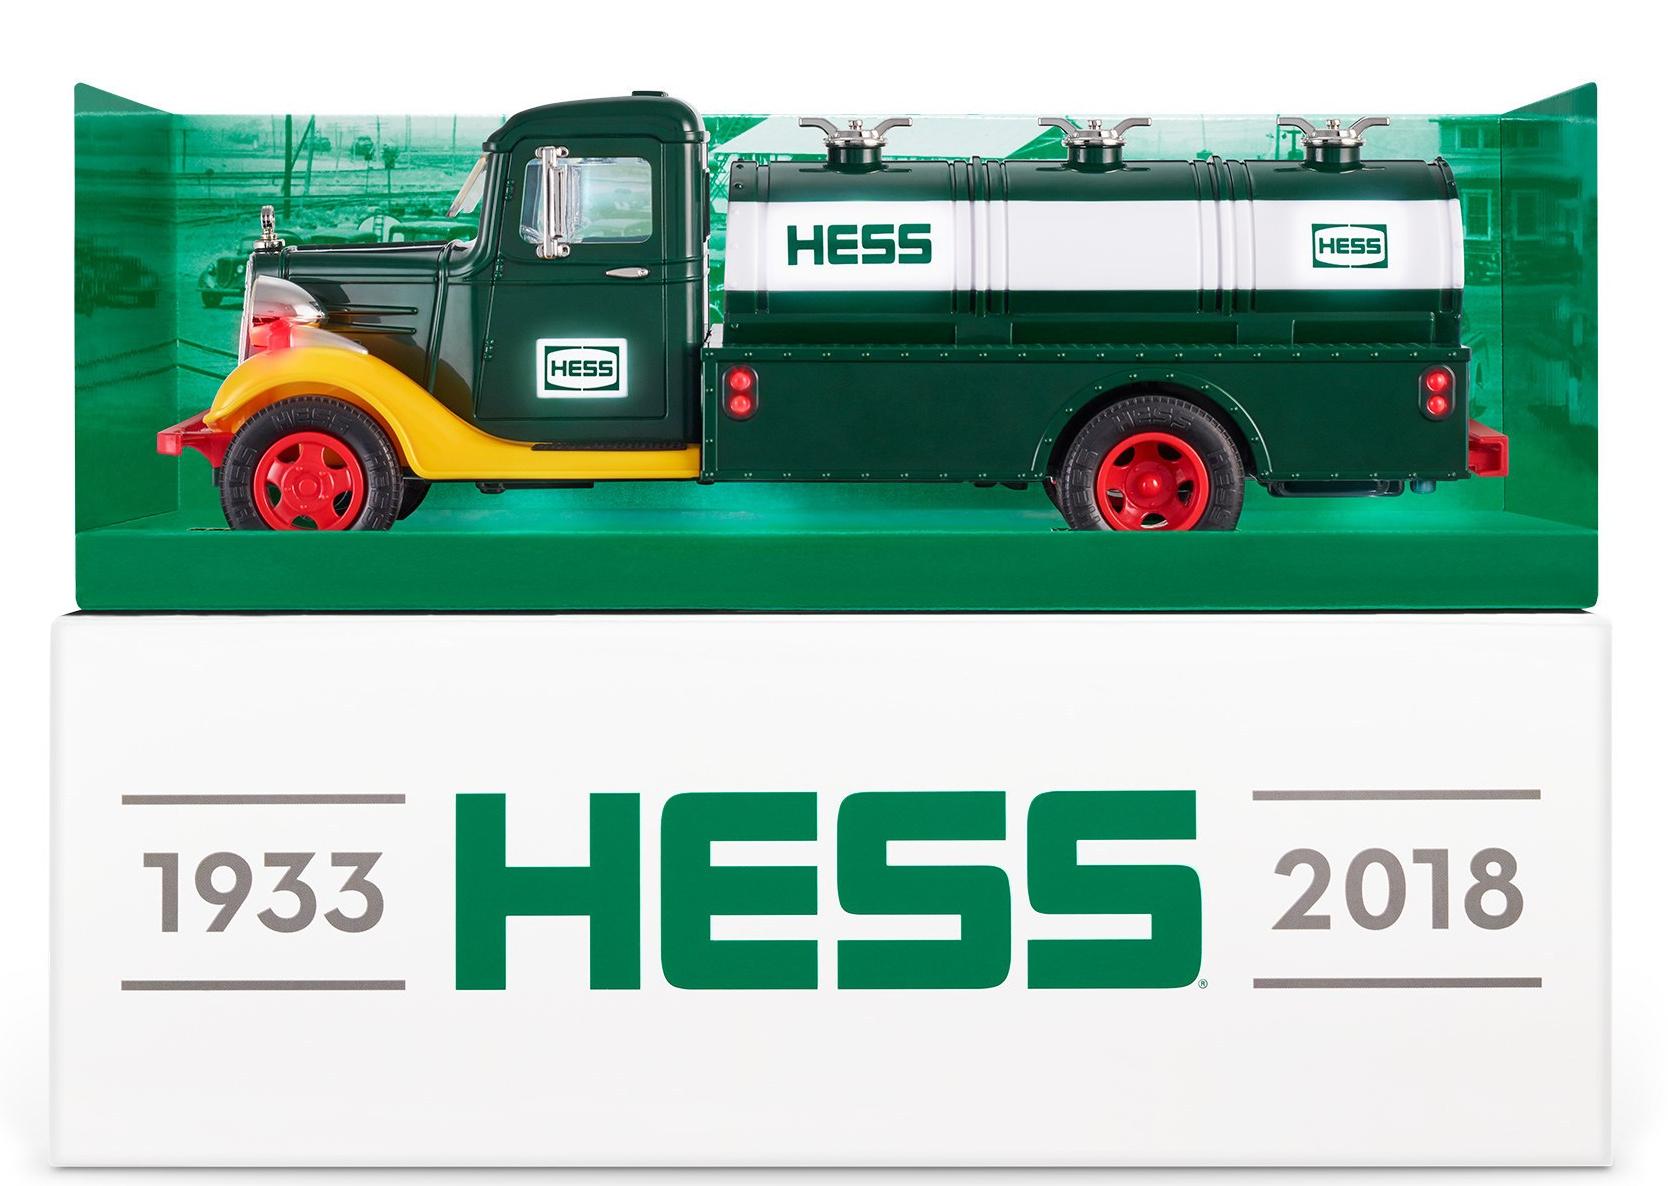 hess_corporation-1.jpg